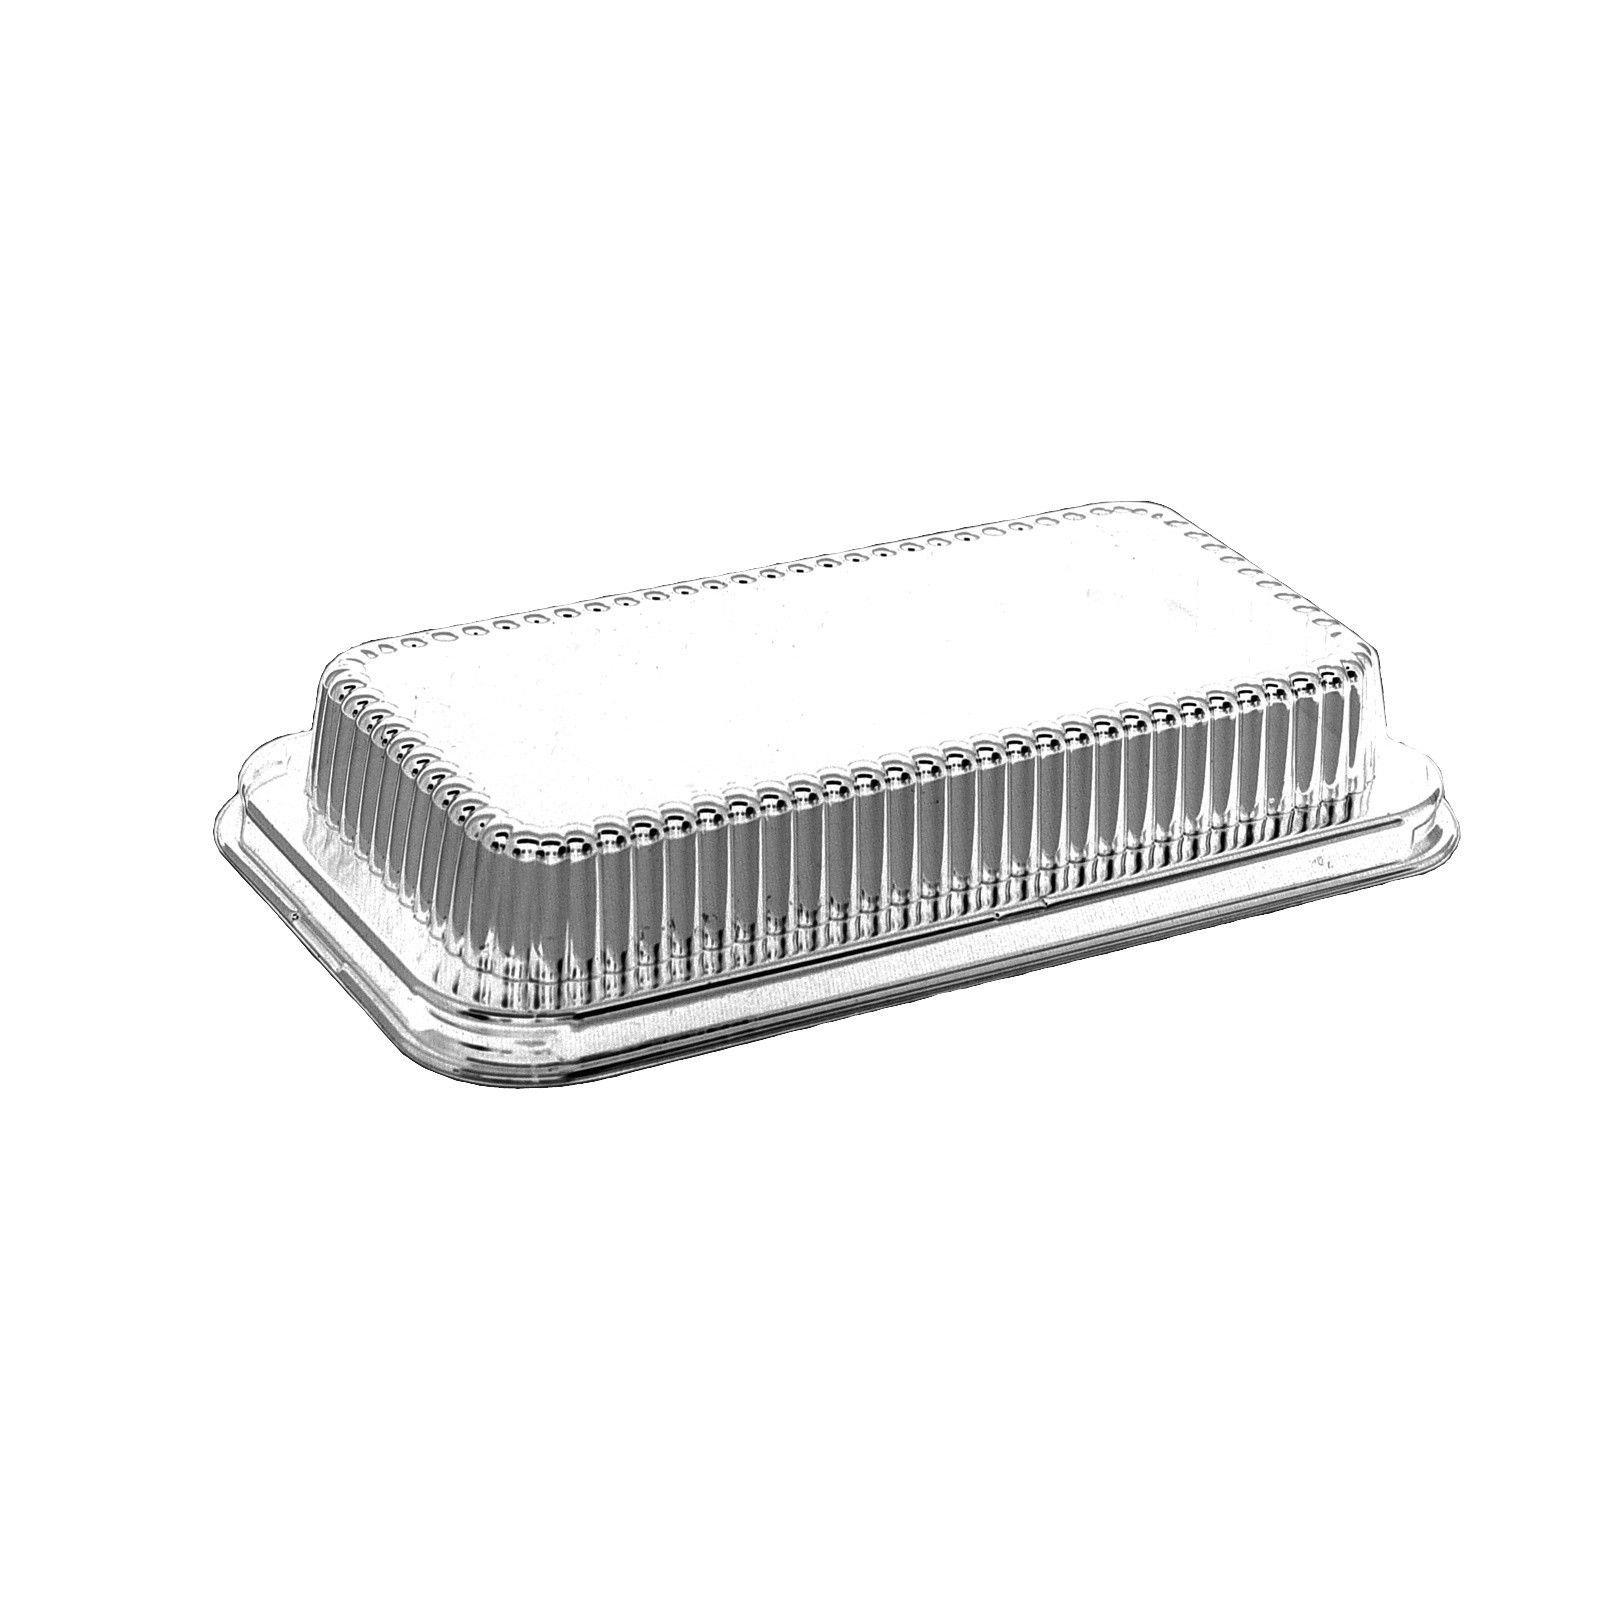 Handi-Foil 2 lb. Aluminum Foil Loaf Bread Pan Tin w/Dome Lid Heavy Duty Hfa #316 (pack of 25)